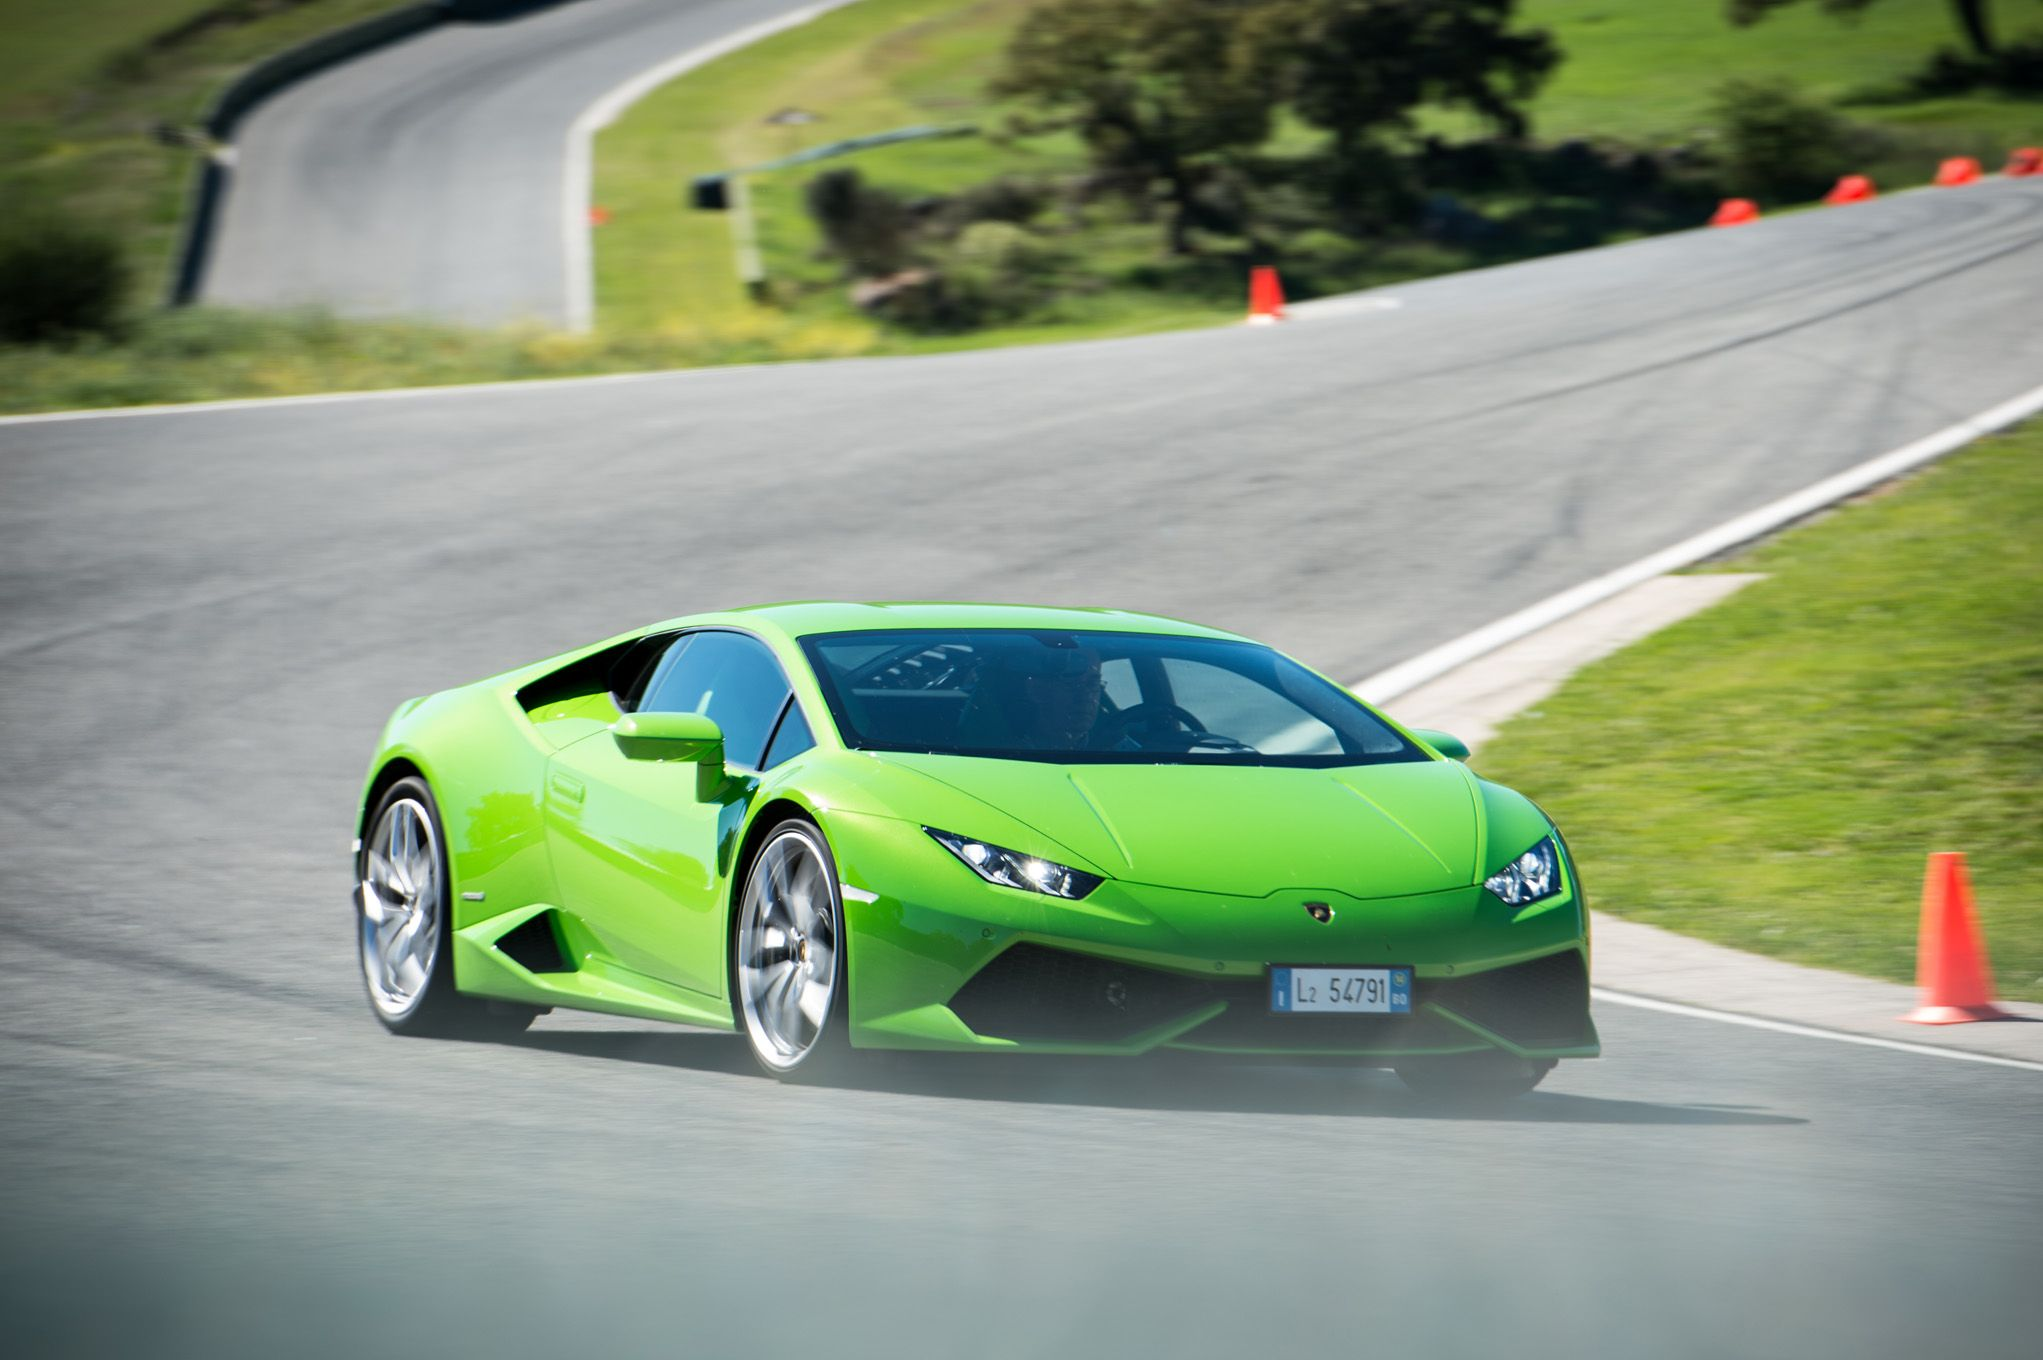 98dc8fae6f0cac542a87ffe0bc4ecd94 Marvelous Lamborghini Huracan Hack asphalt 8 Cars Trend